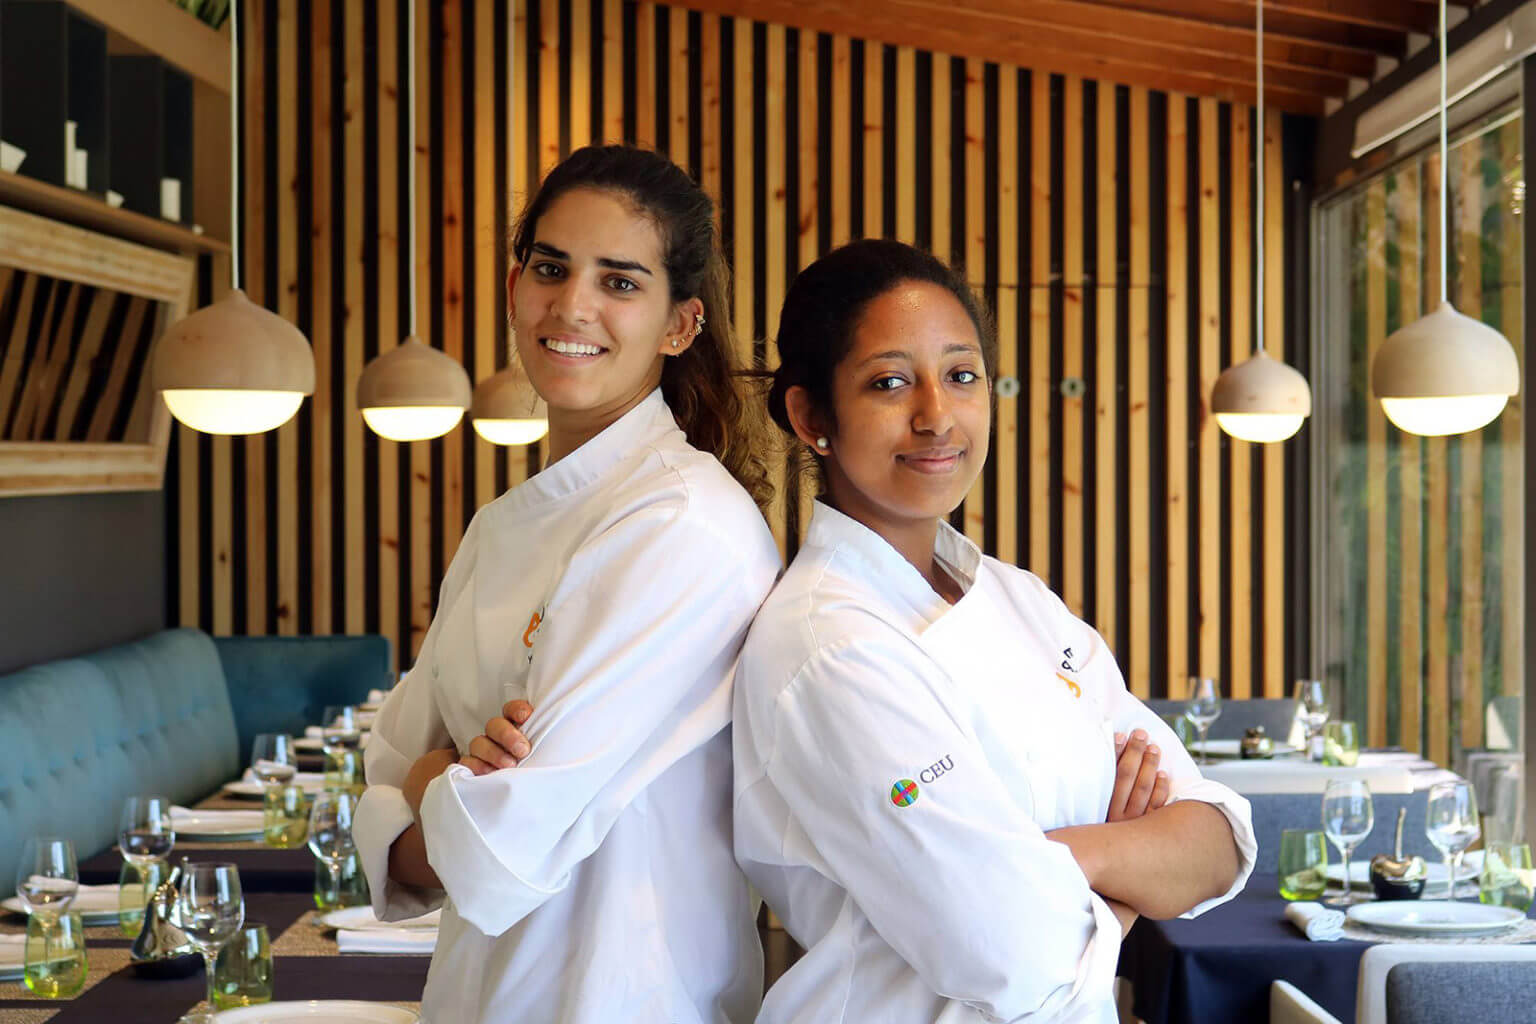 gastronomia en femenino entrada blog gasma